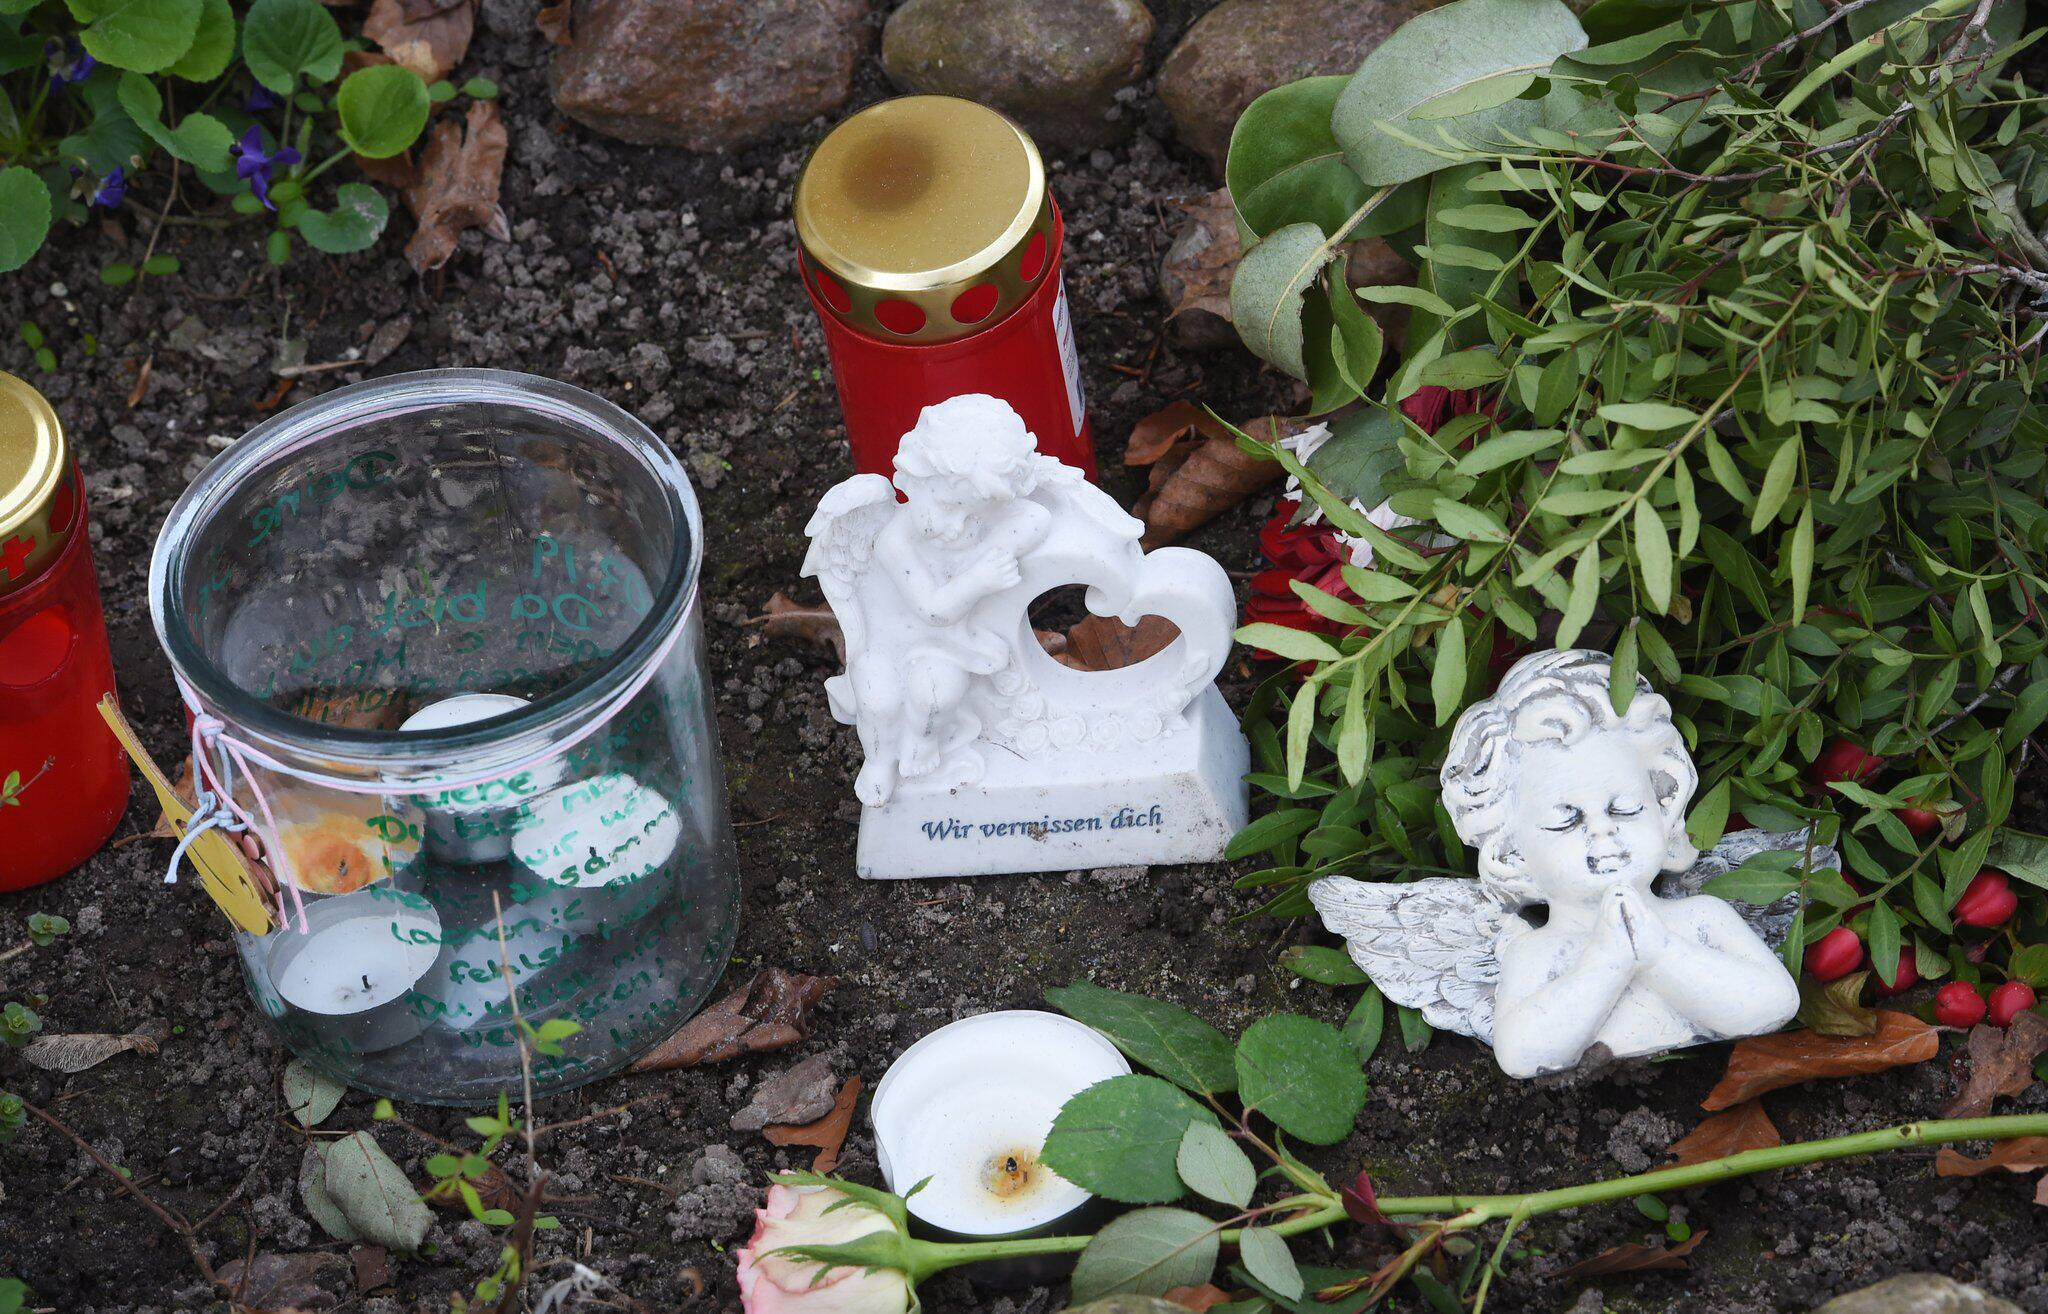 Bild zu Zinnowitz, Trauer, Kerzen, Maria, Mordfall, Tod